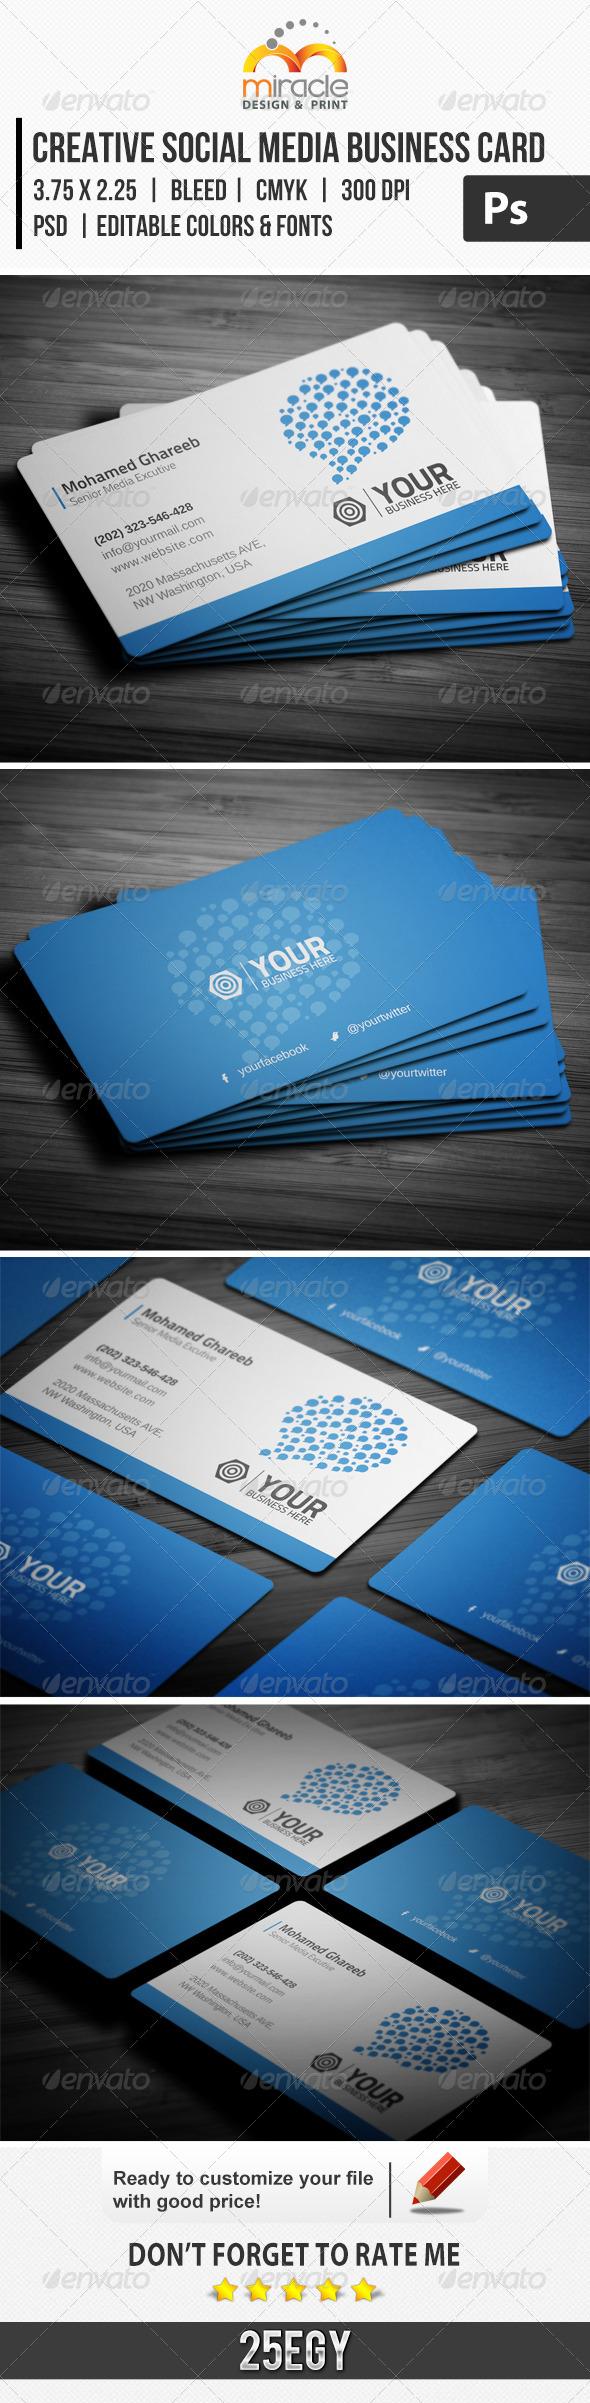 Creative Social Media Business Card - Creative Business Cards